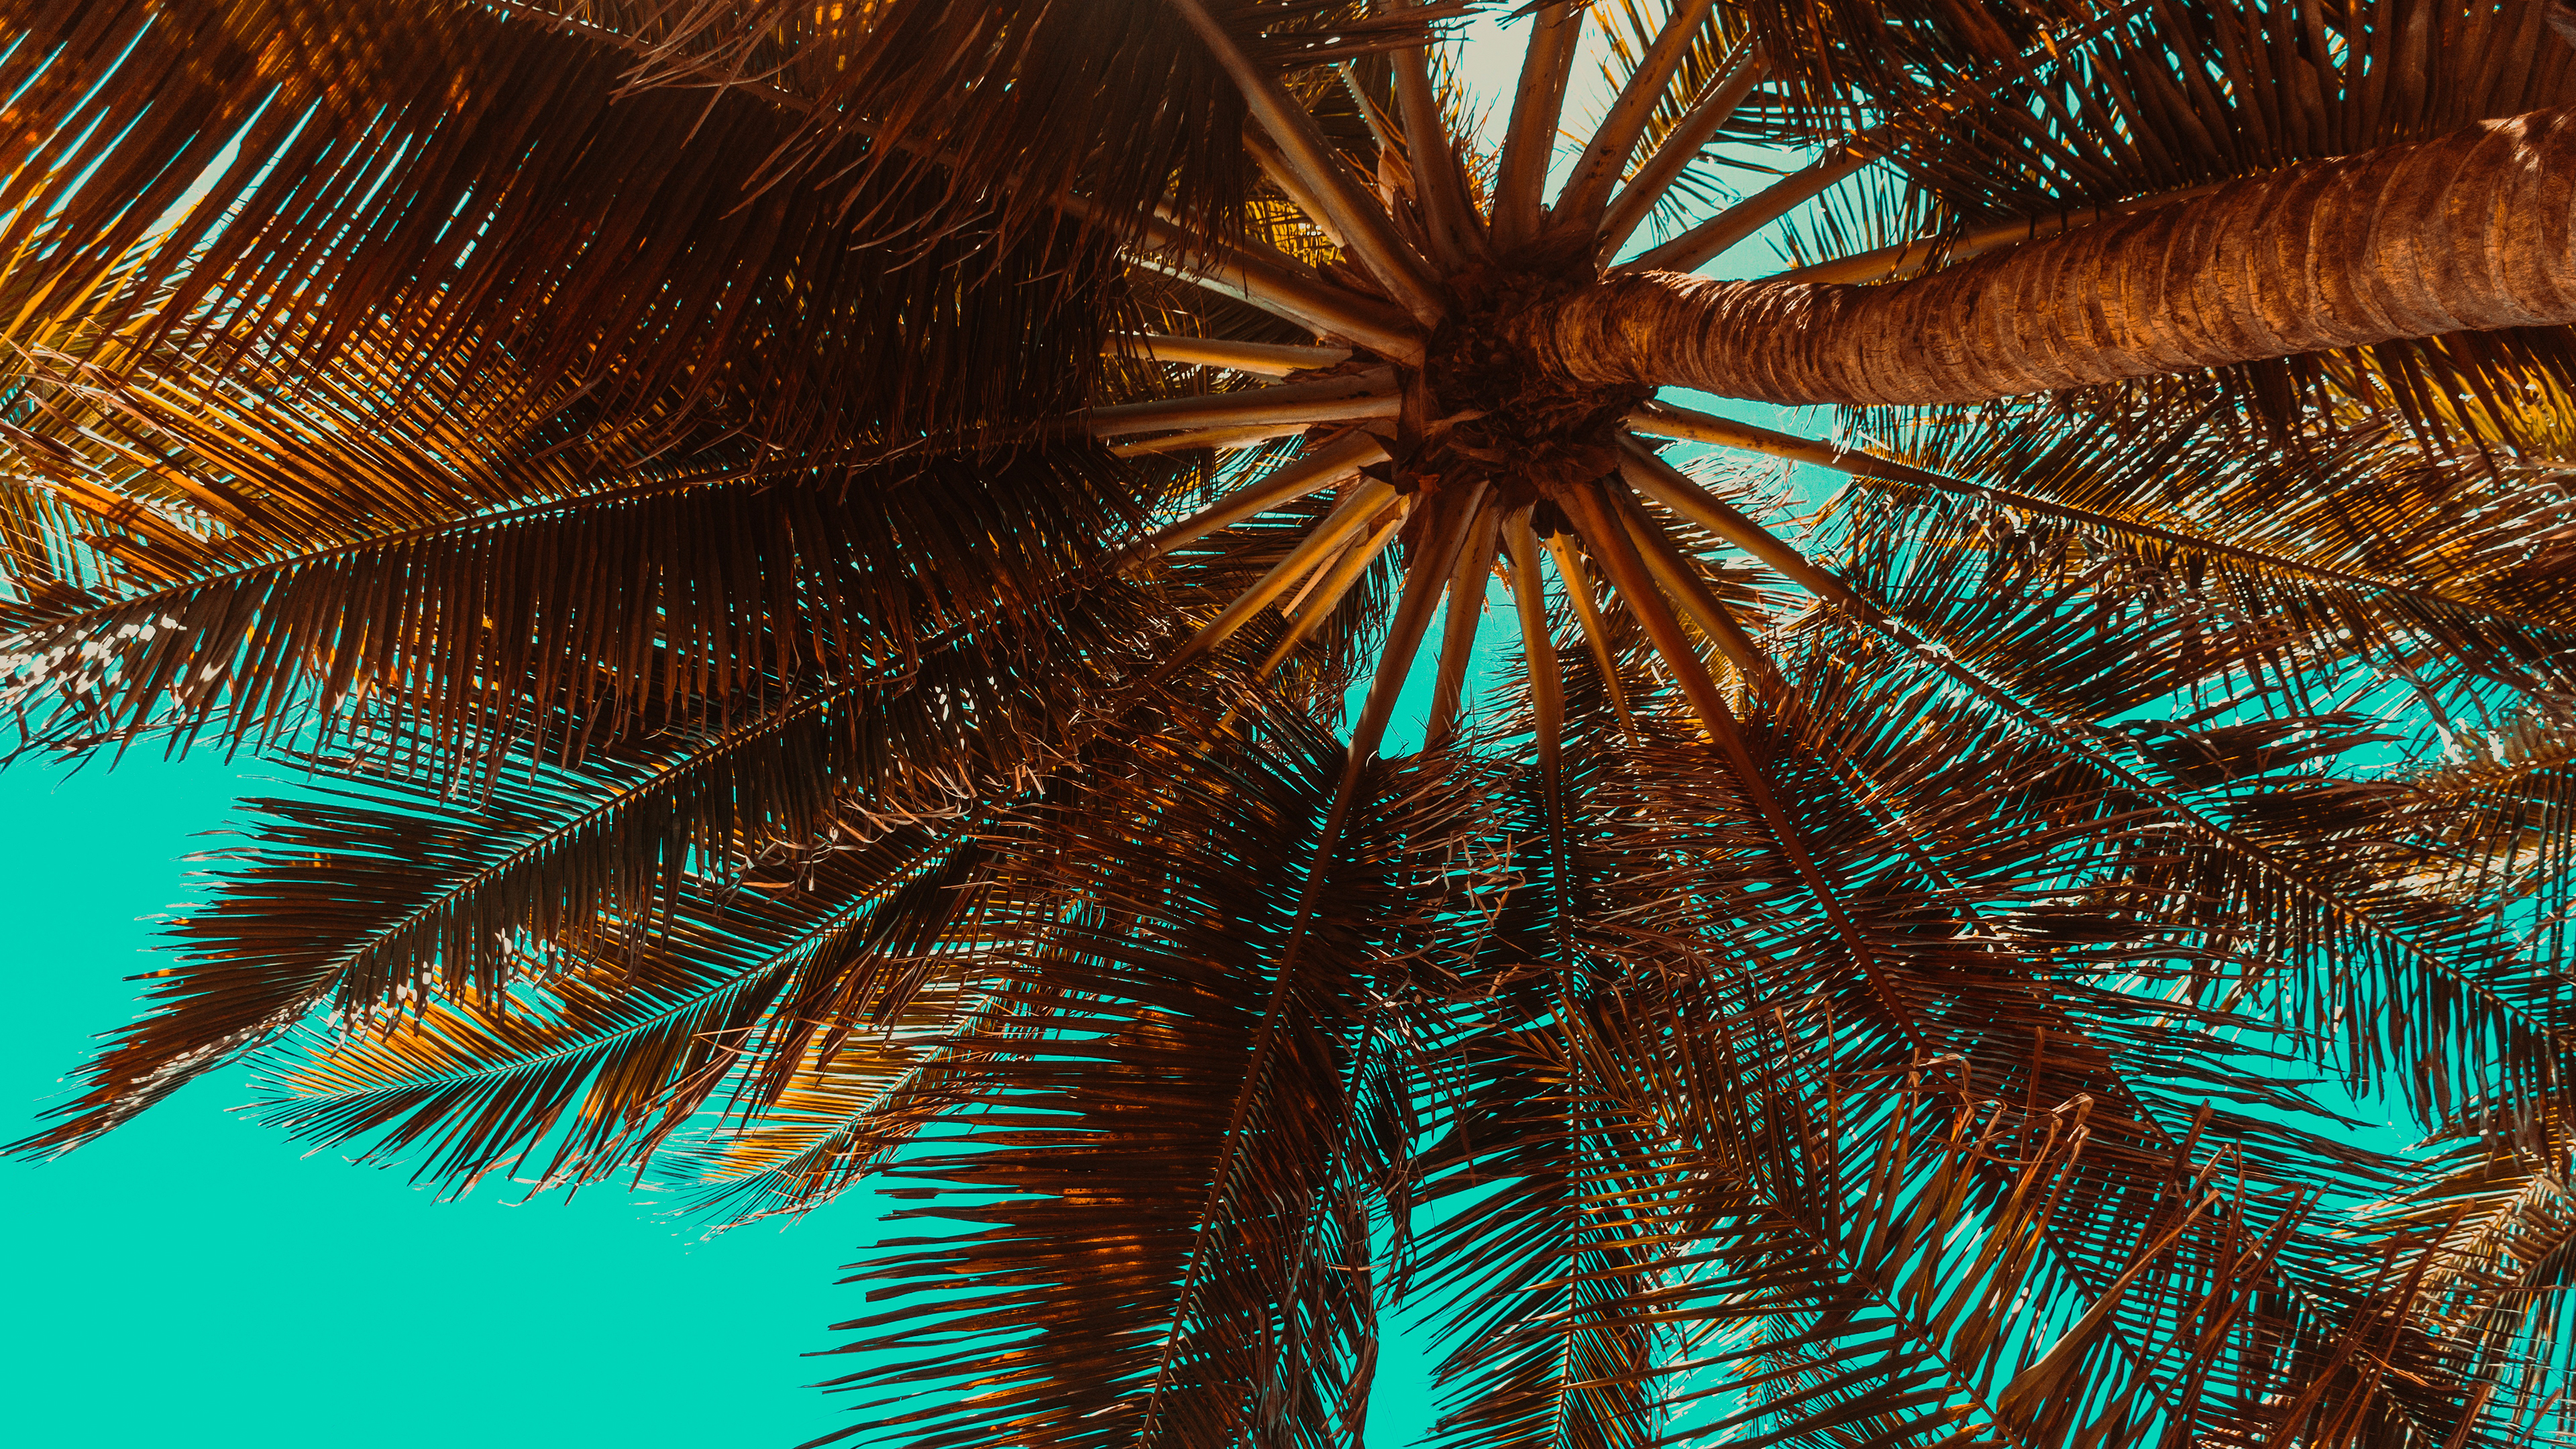 4k Tropical Palm Tree Wallpaper Hd